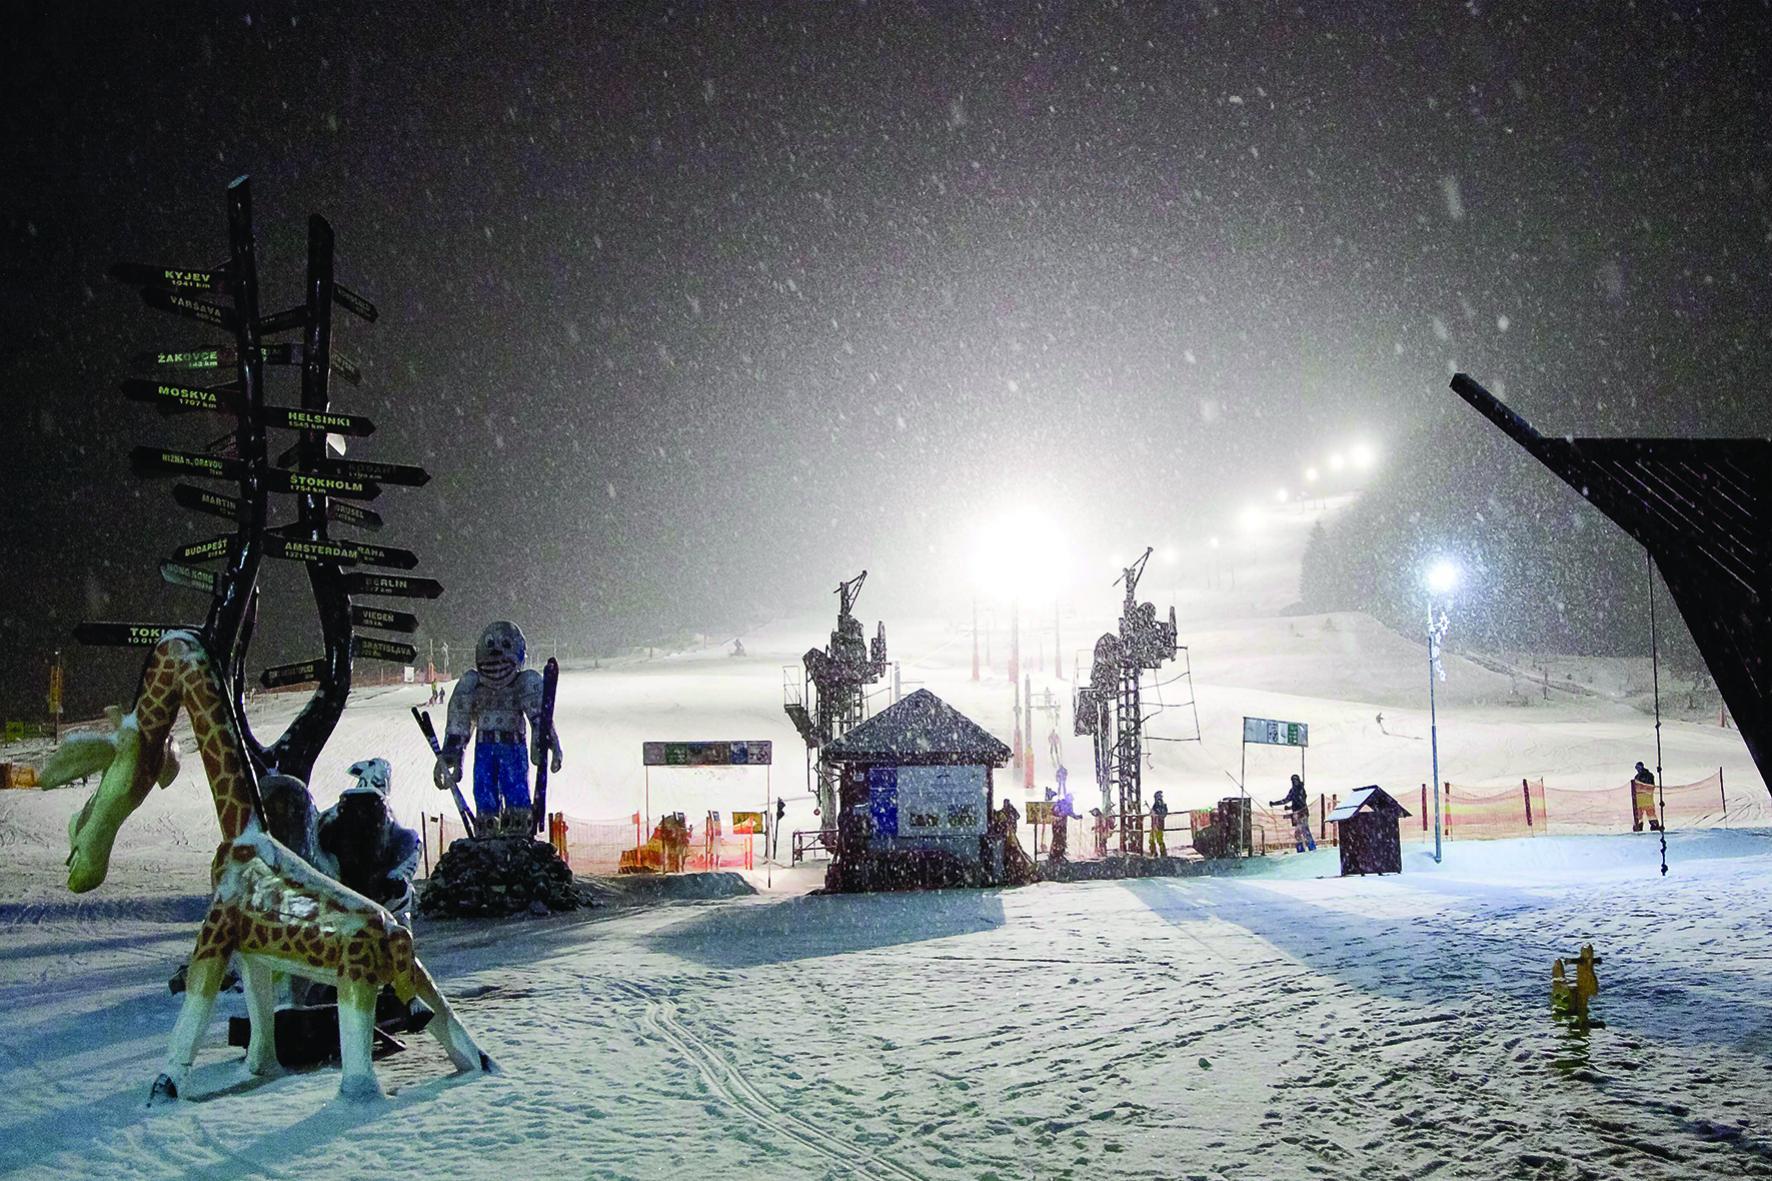 Novinky v SNOWLAND Valčianska dolina - Dovolenky - Zima  7e8c2e39de